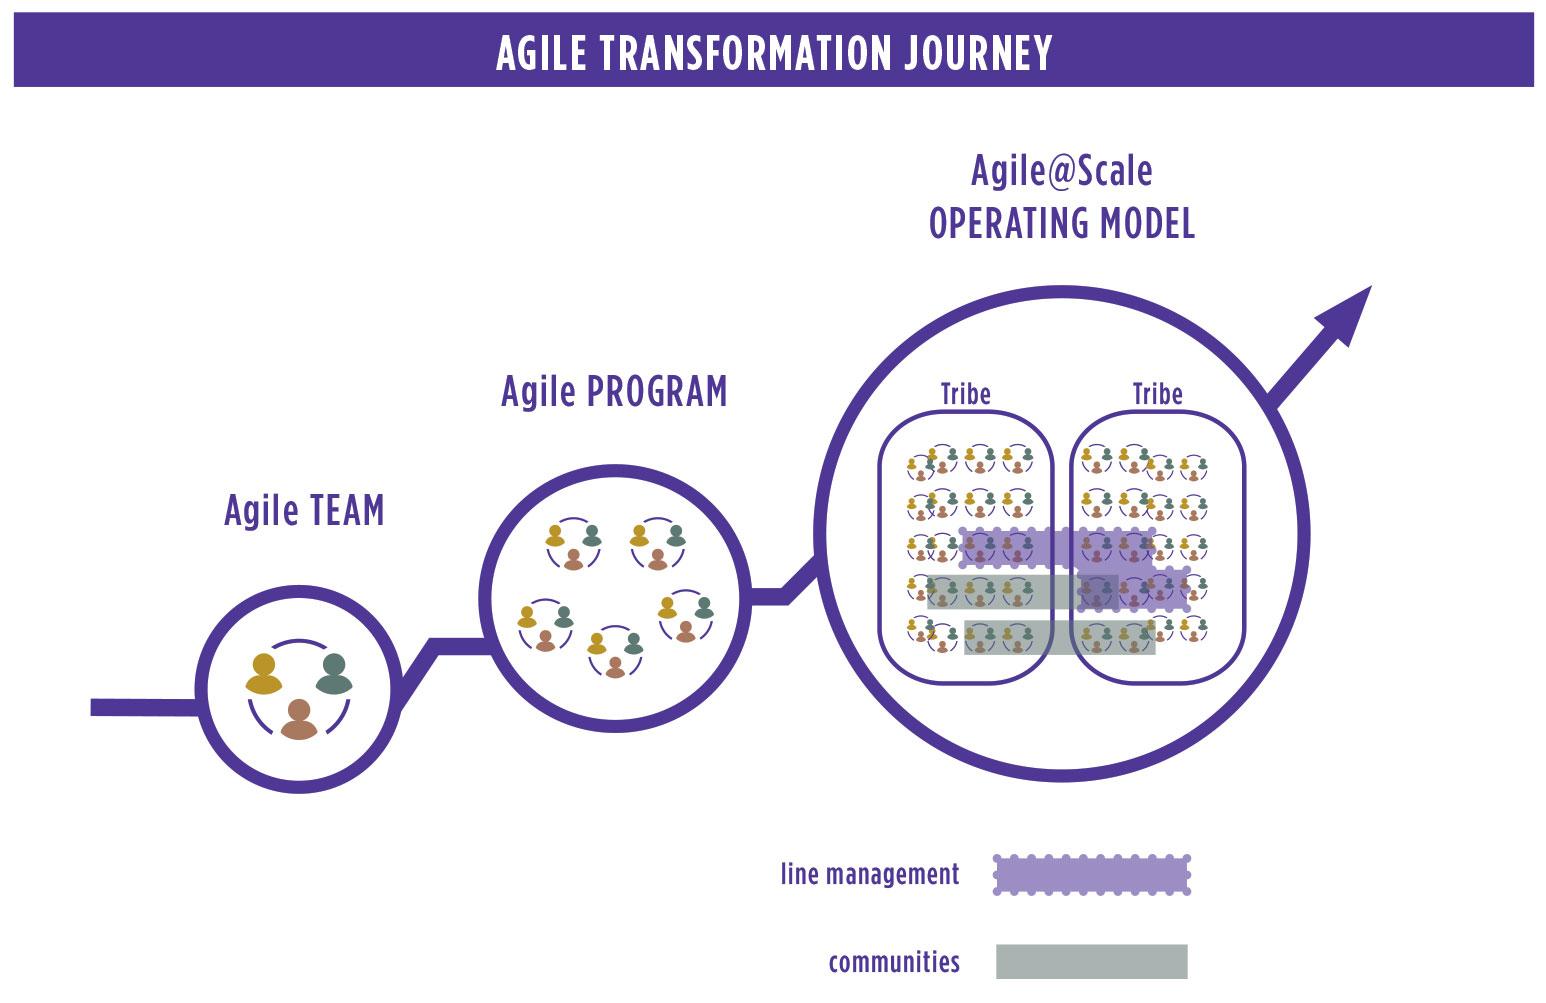 Agile Transformation Journey